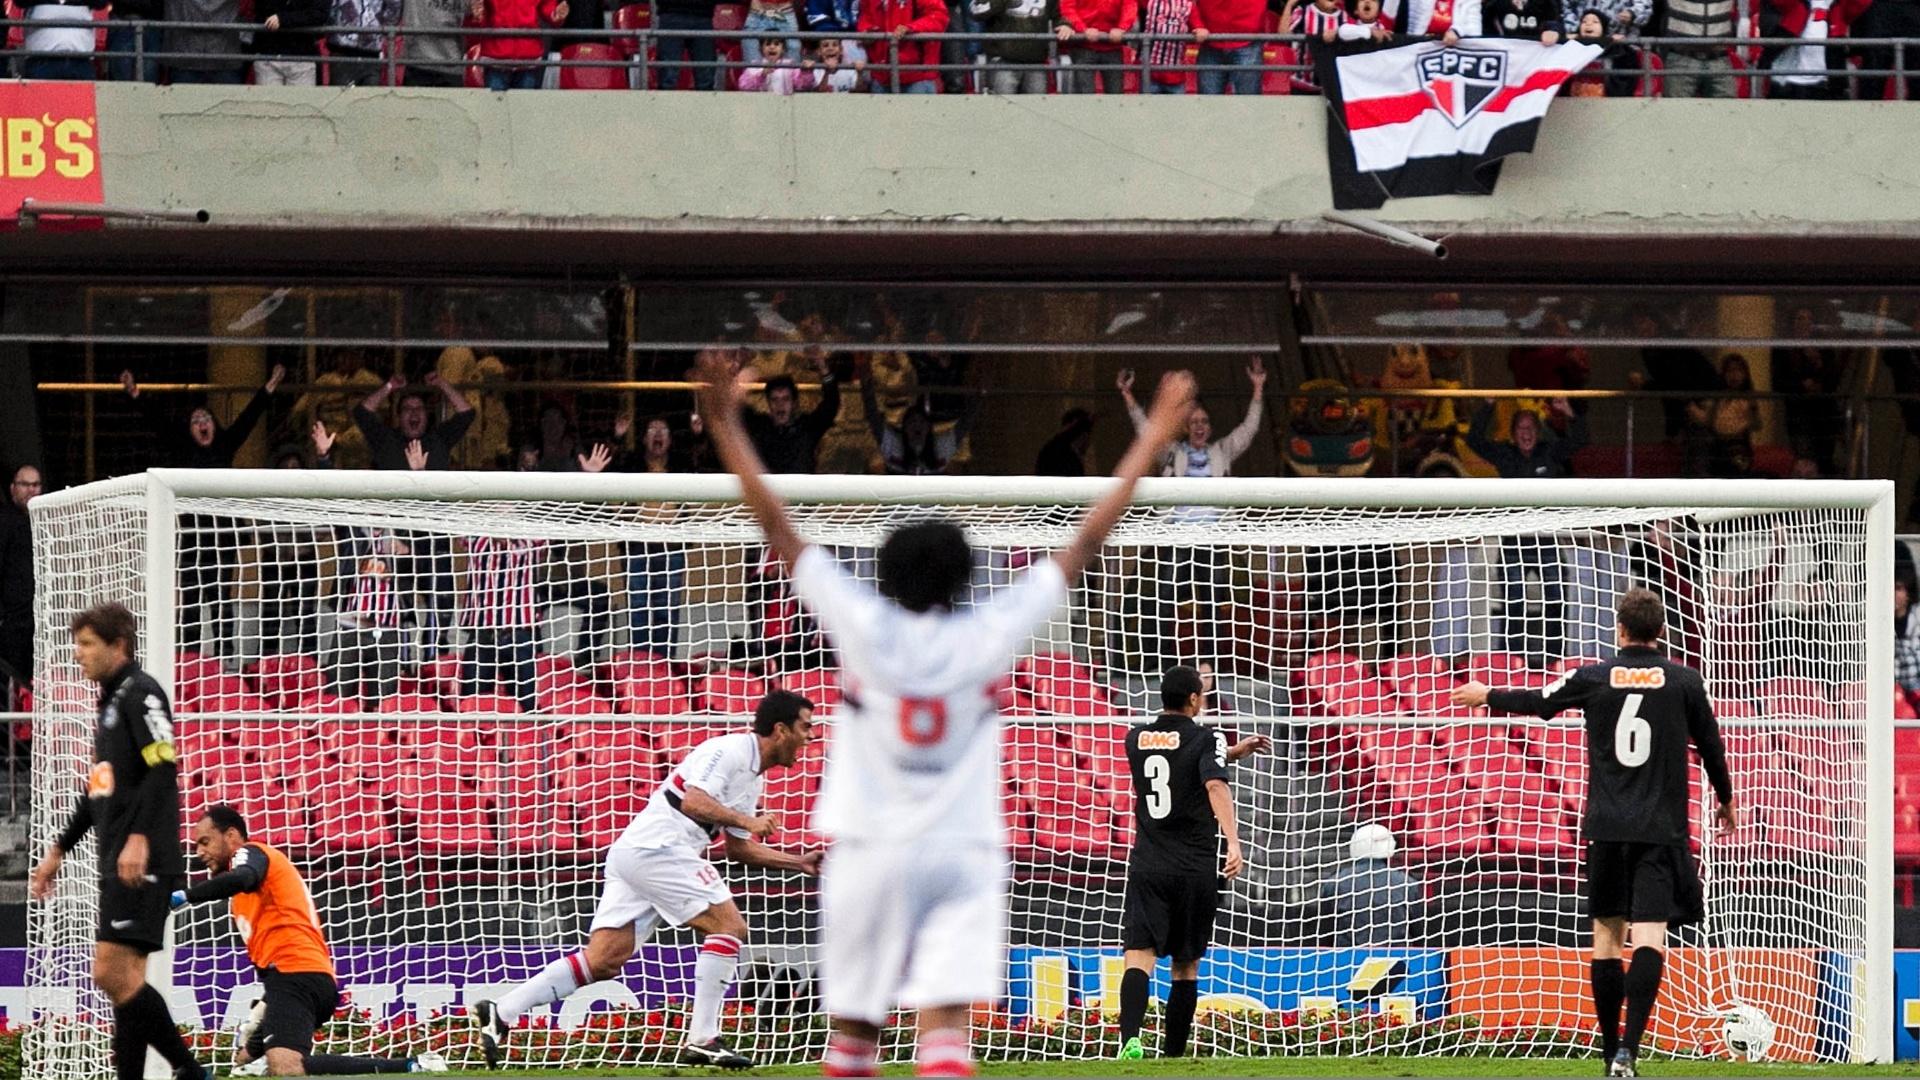 Maicon comemora gol marcado no Morumbi sobre o Coritiba, o segundo do São Paulo